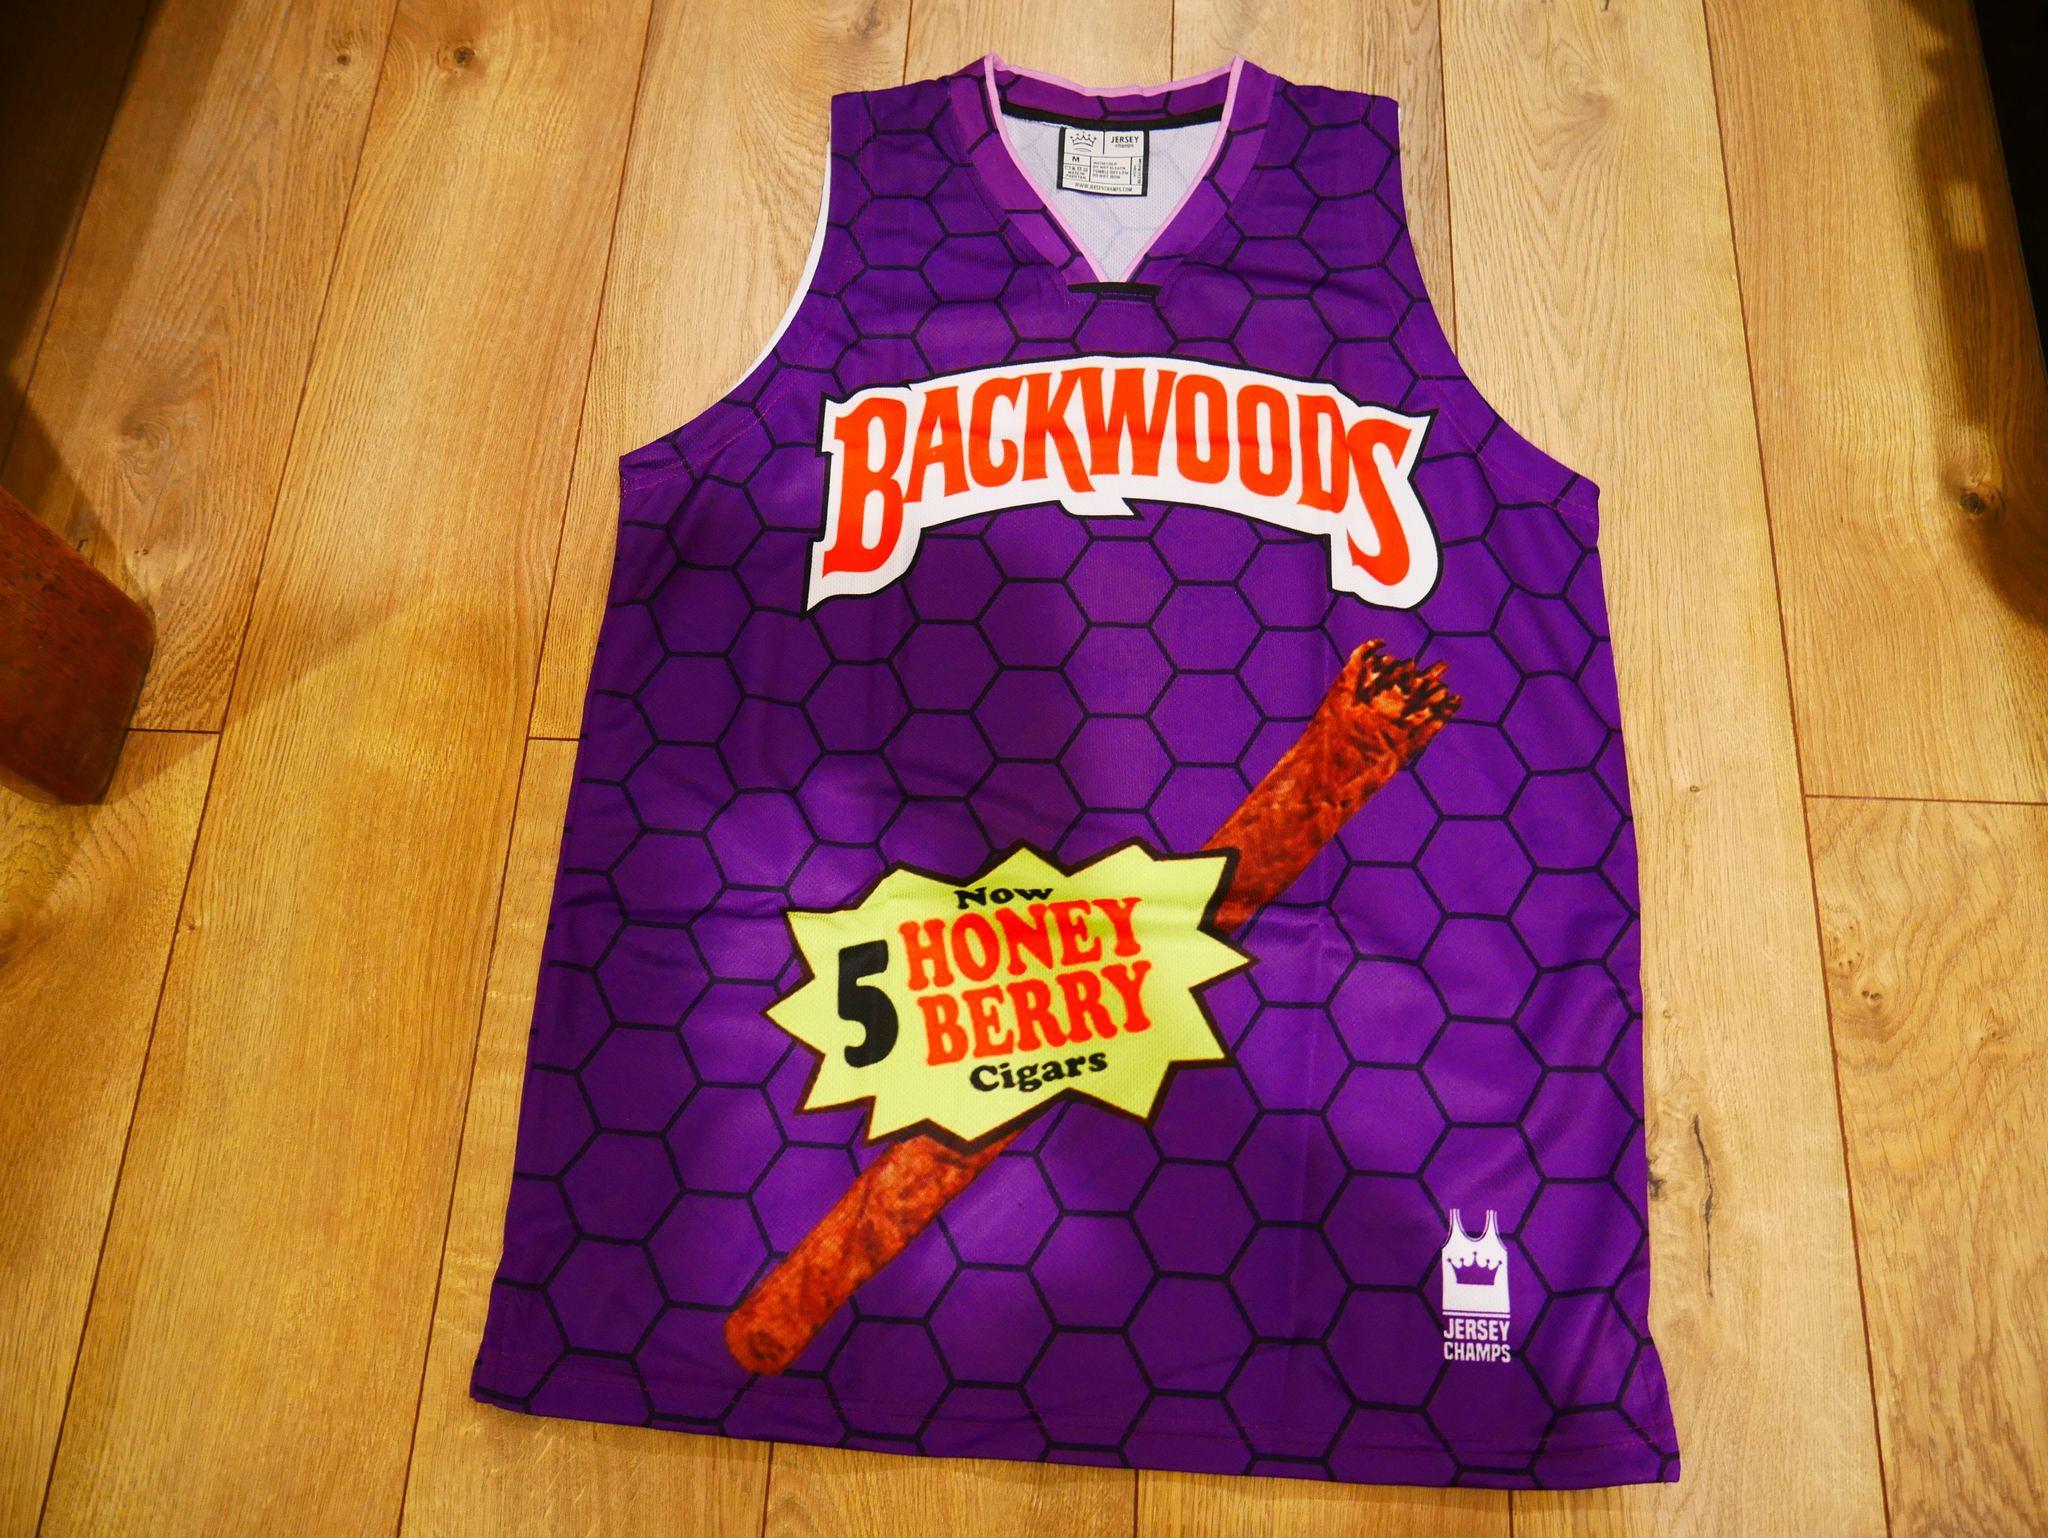 477ad0b7b Backwoods Jersey